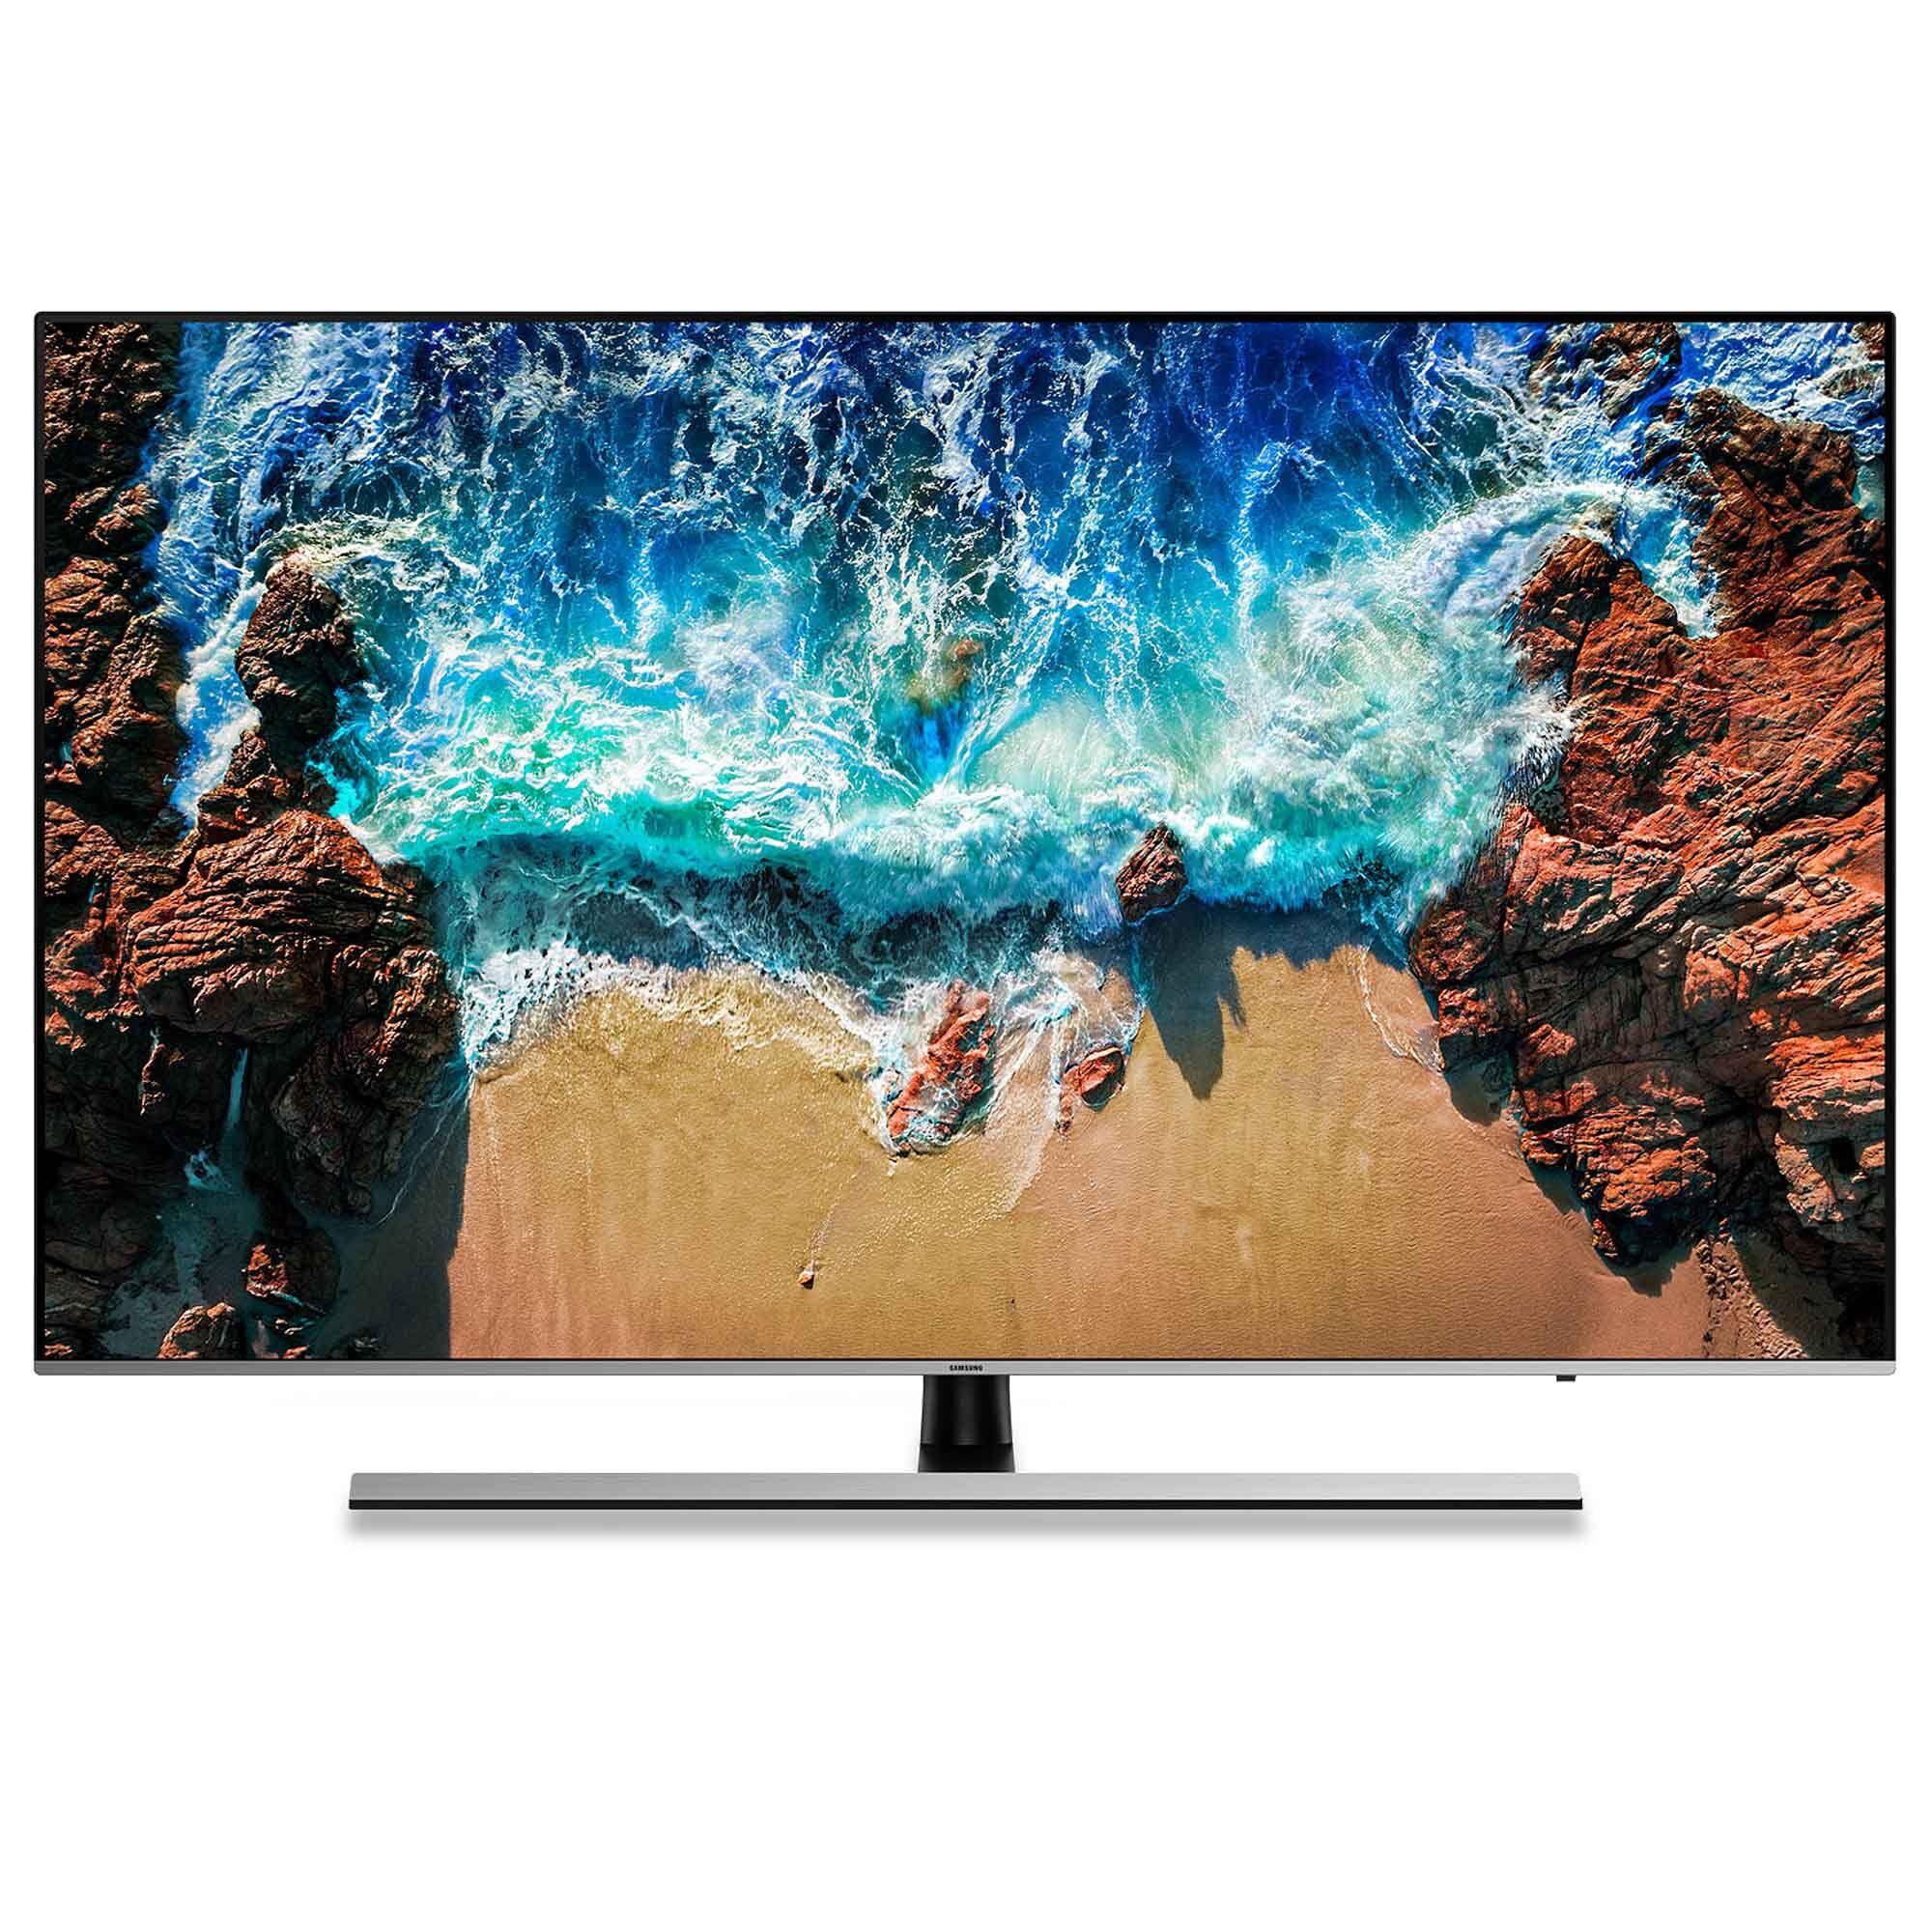 Samsung NU8000 Smart TV LED UHD 4K Slim Design